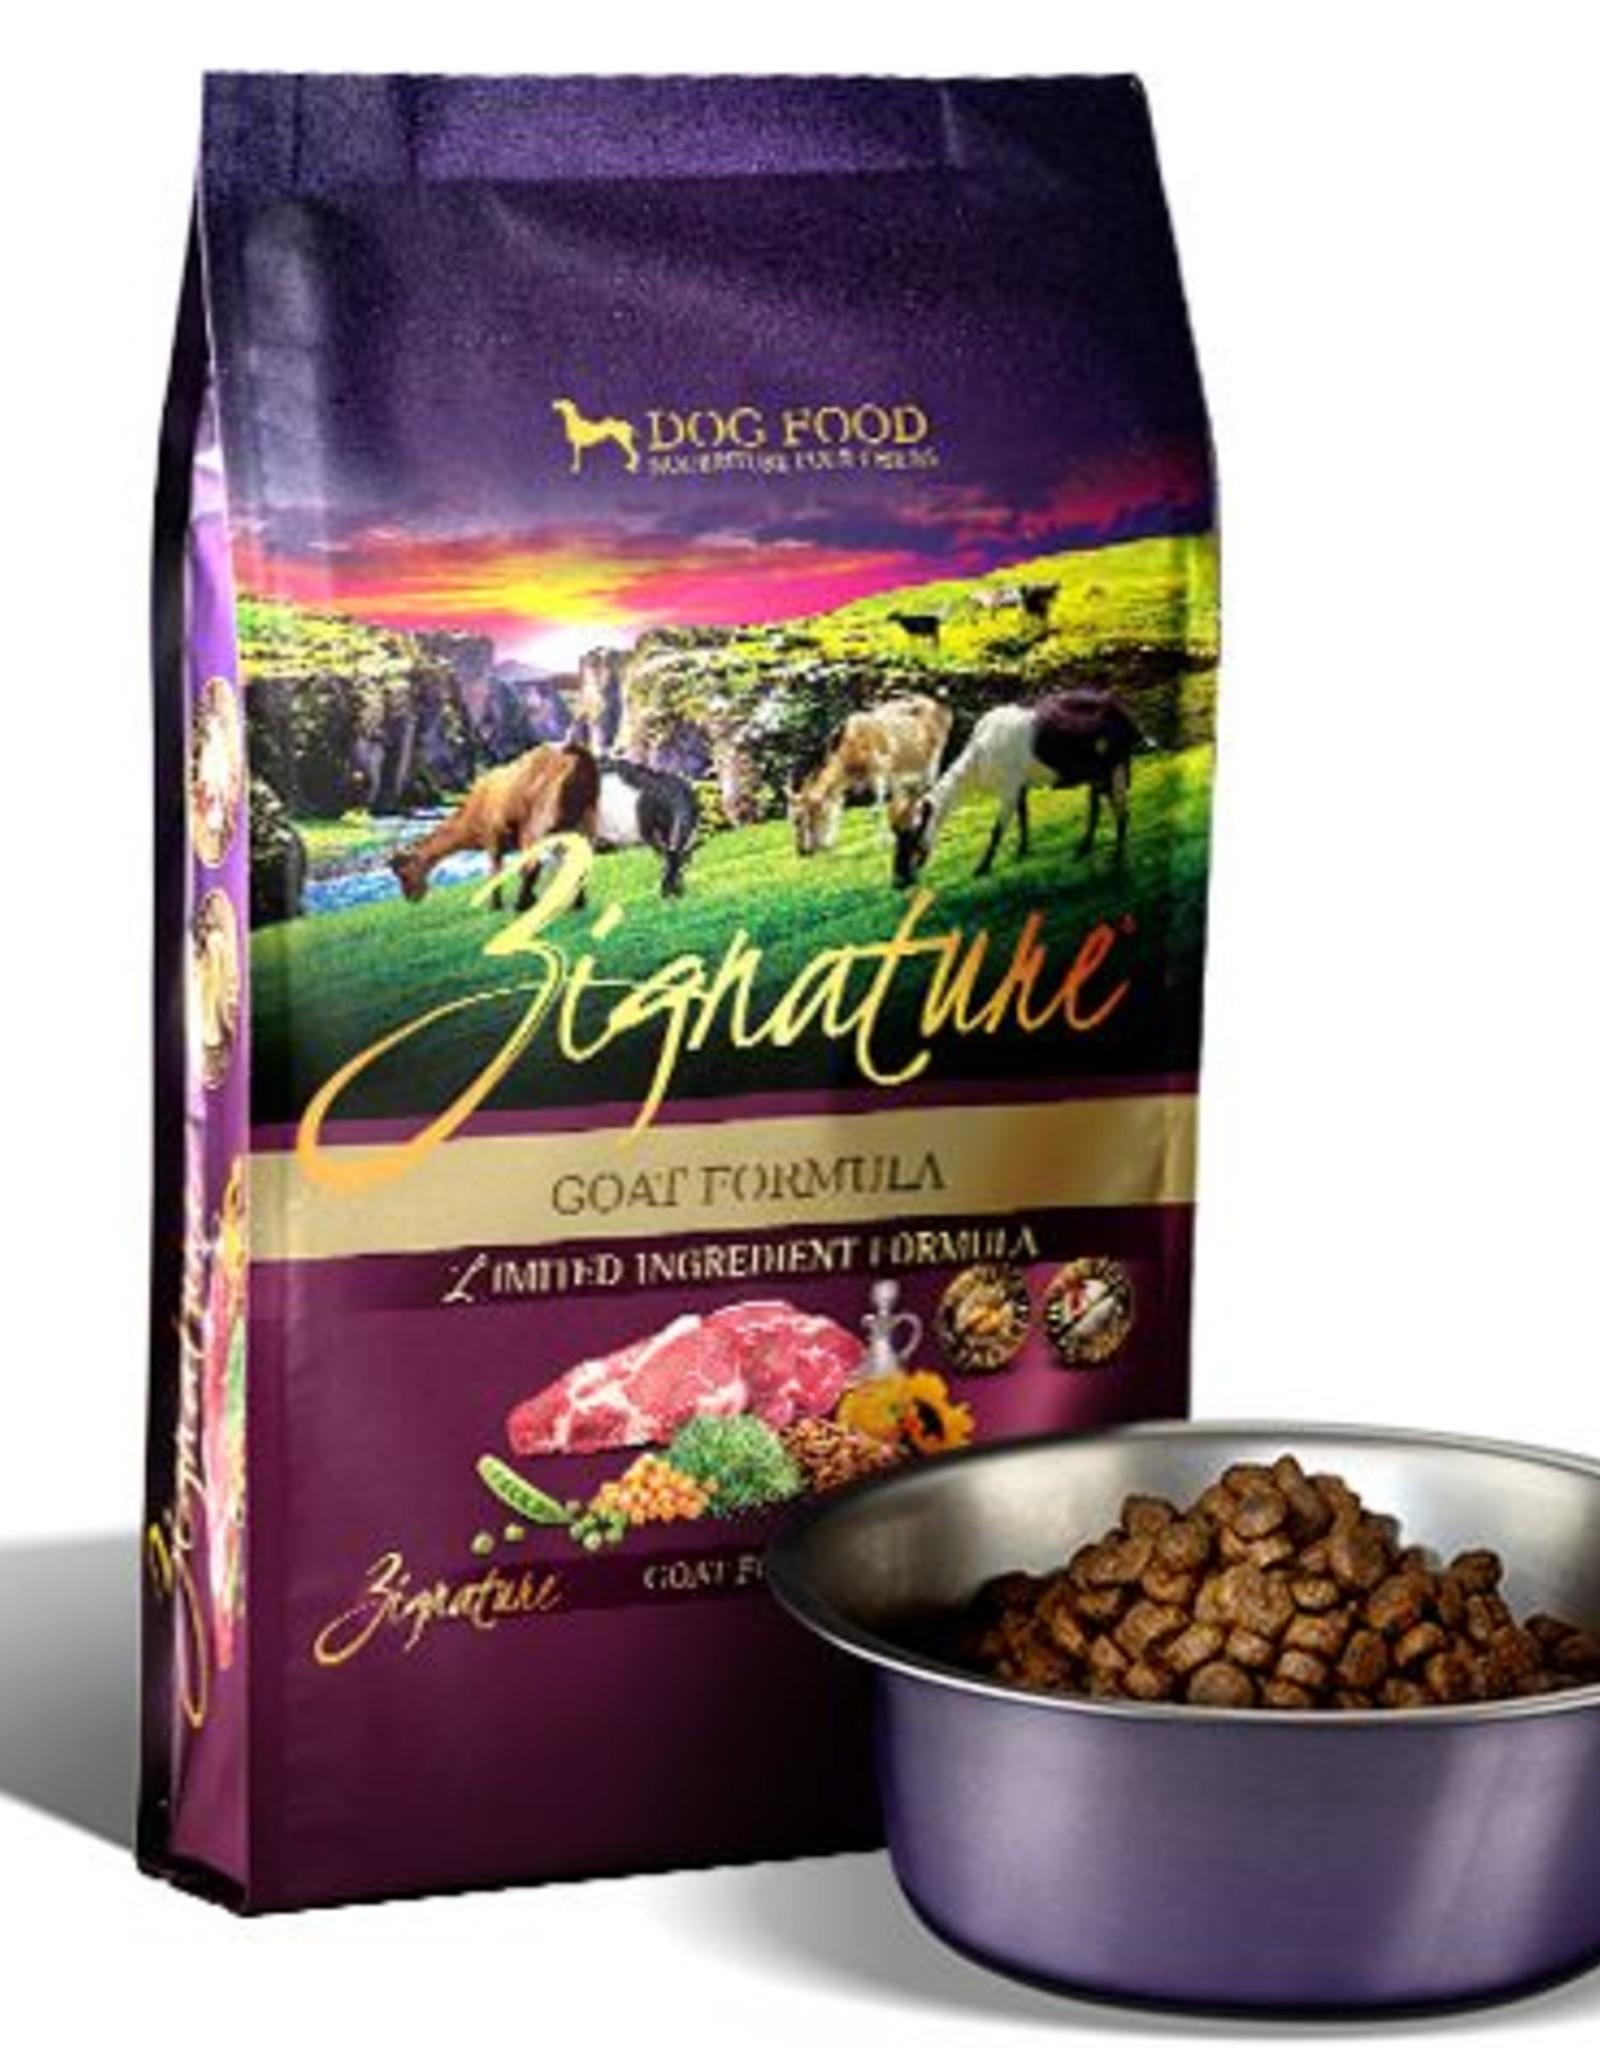 Zignature Goat Limited Ingredient Formula Grain-Free Dry Dog Food